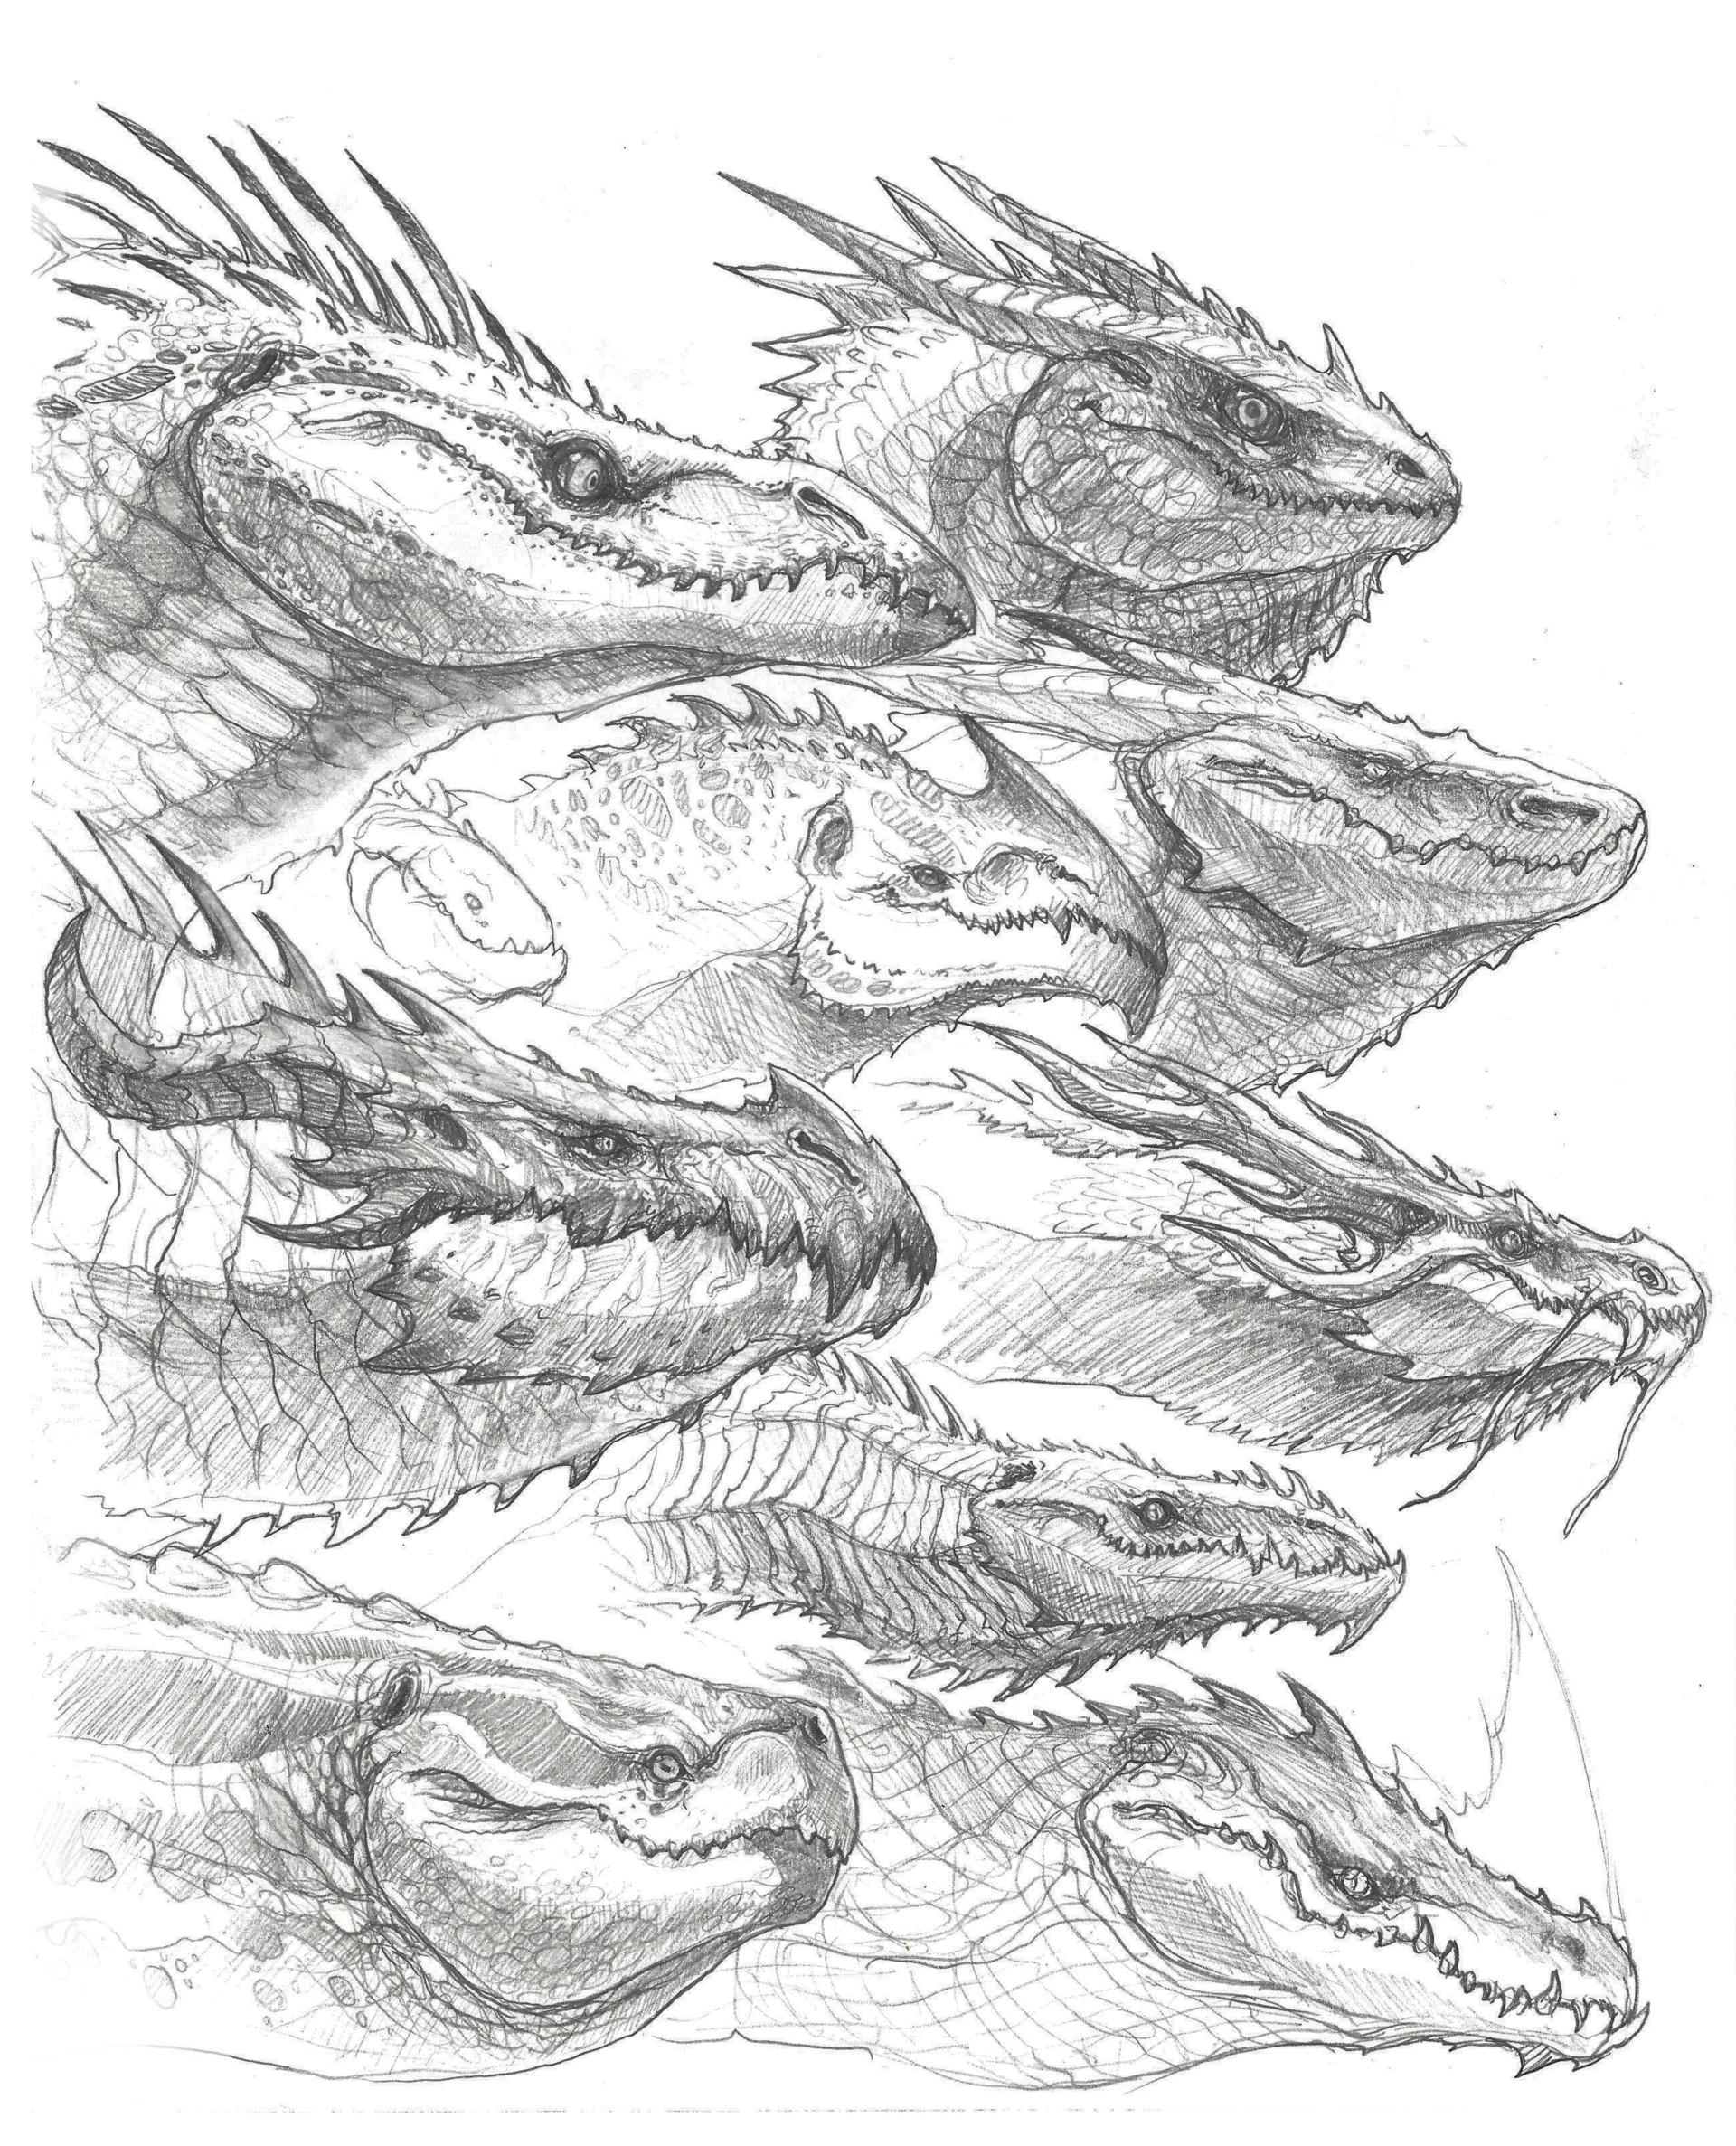 john tedrick dragon head sketches